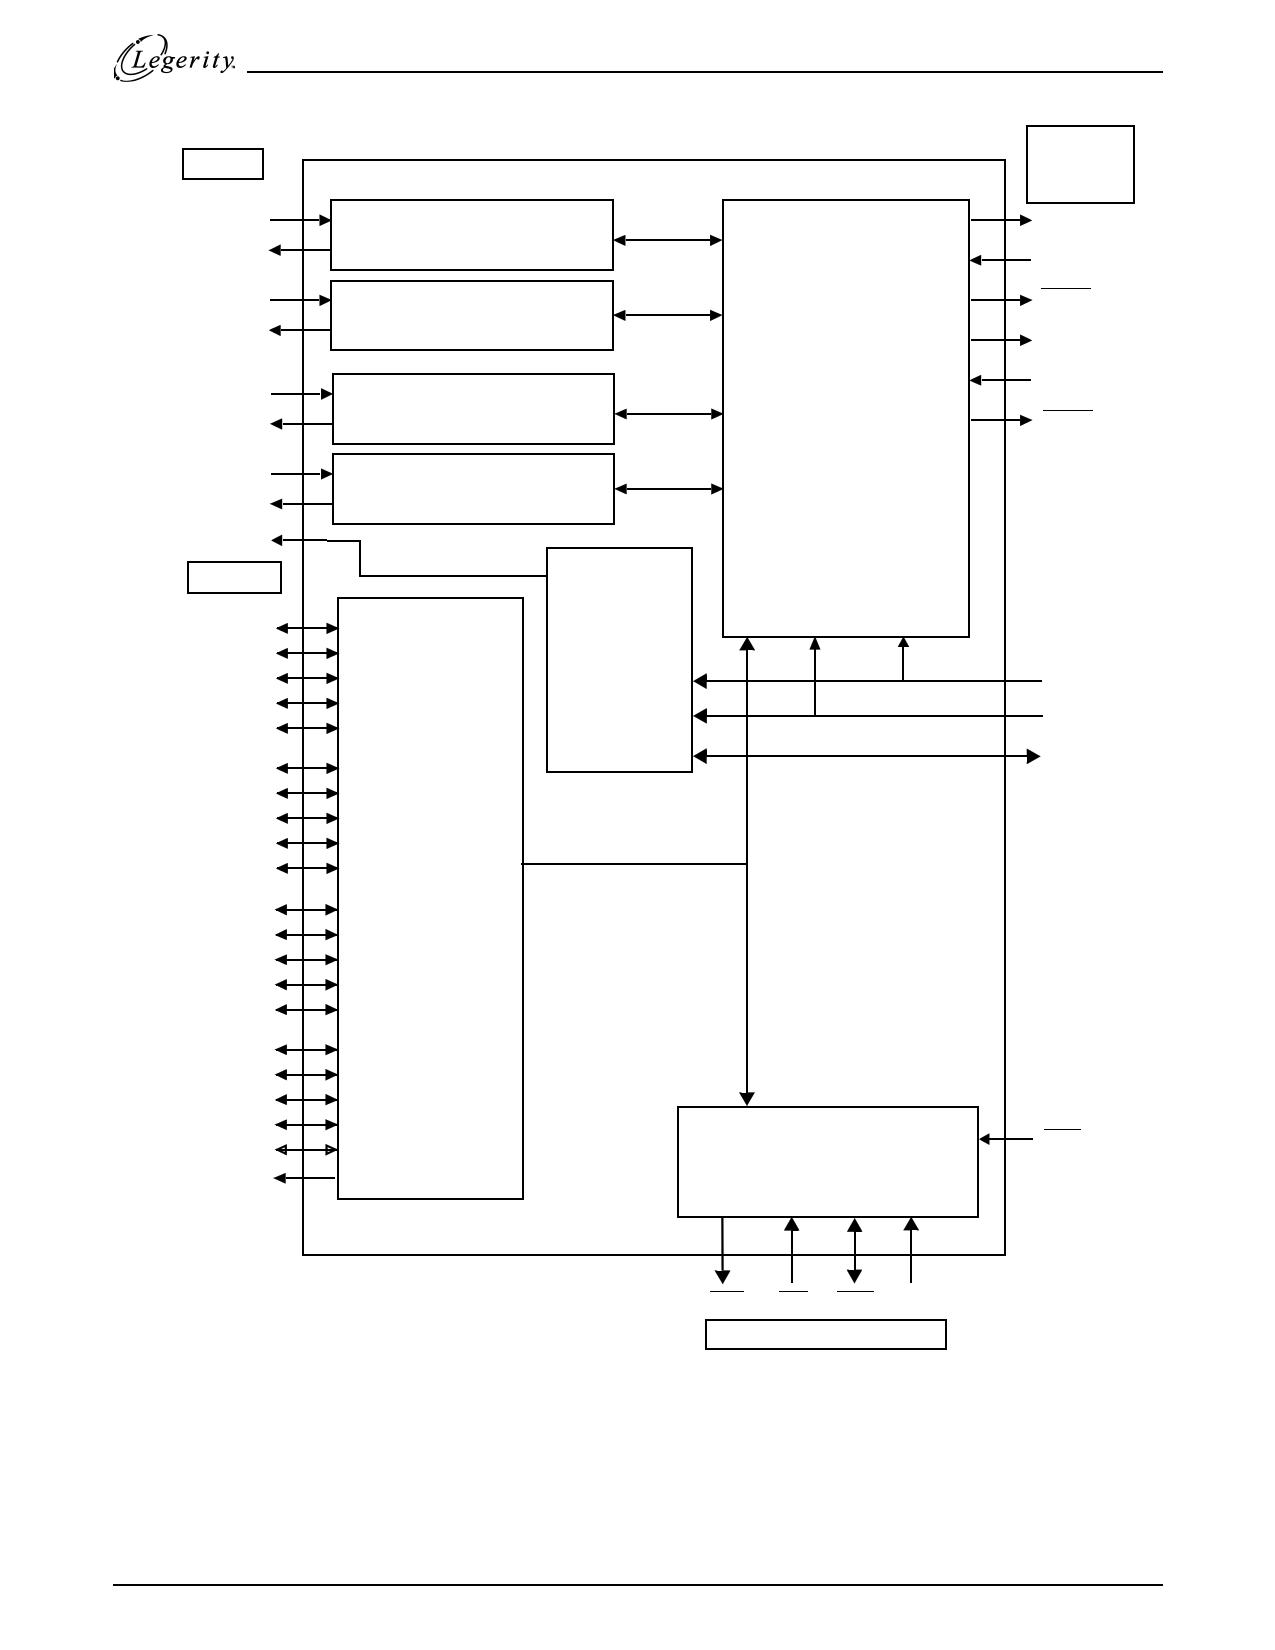 Am79Q031 pdf, 반도체, 판매, 대치품